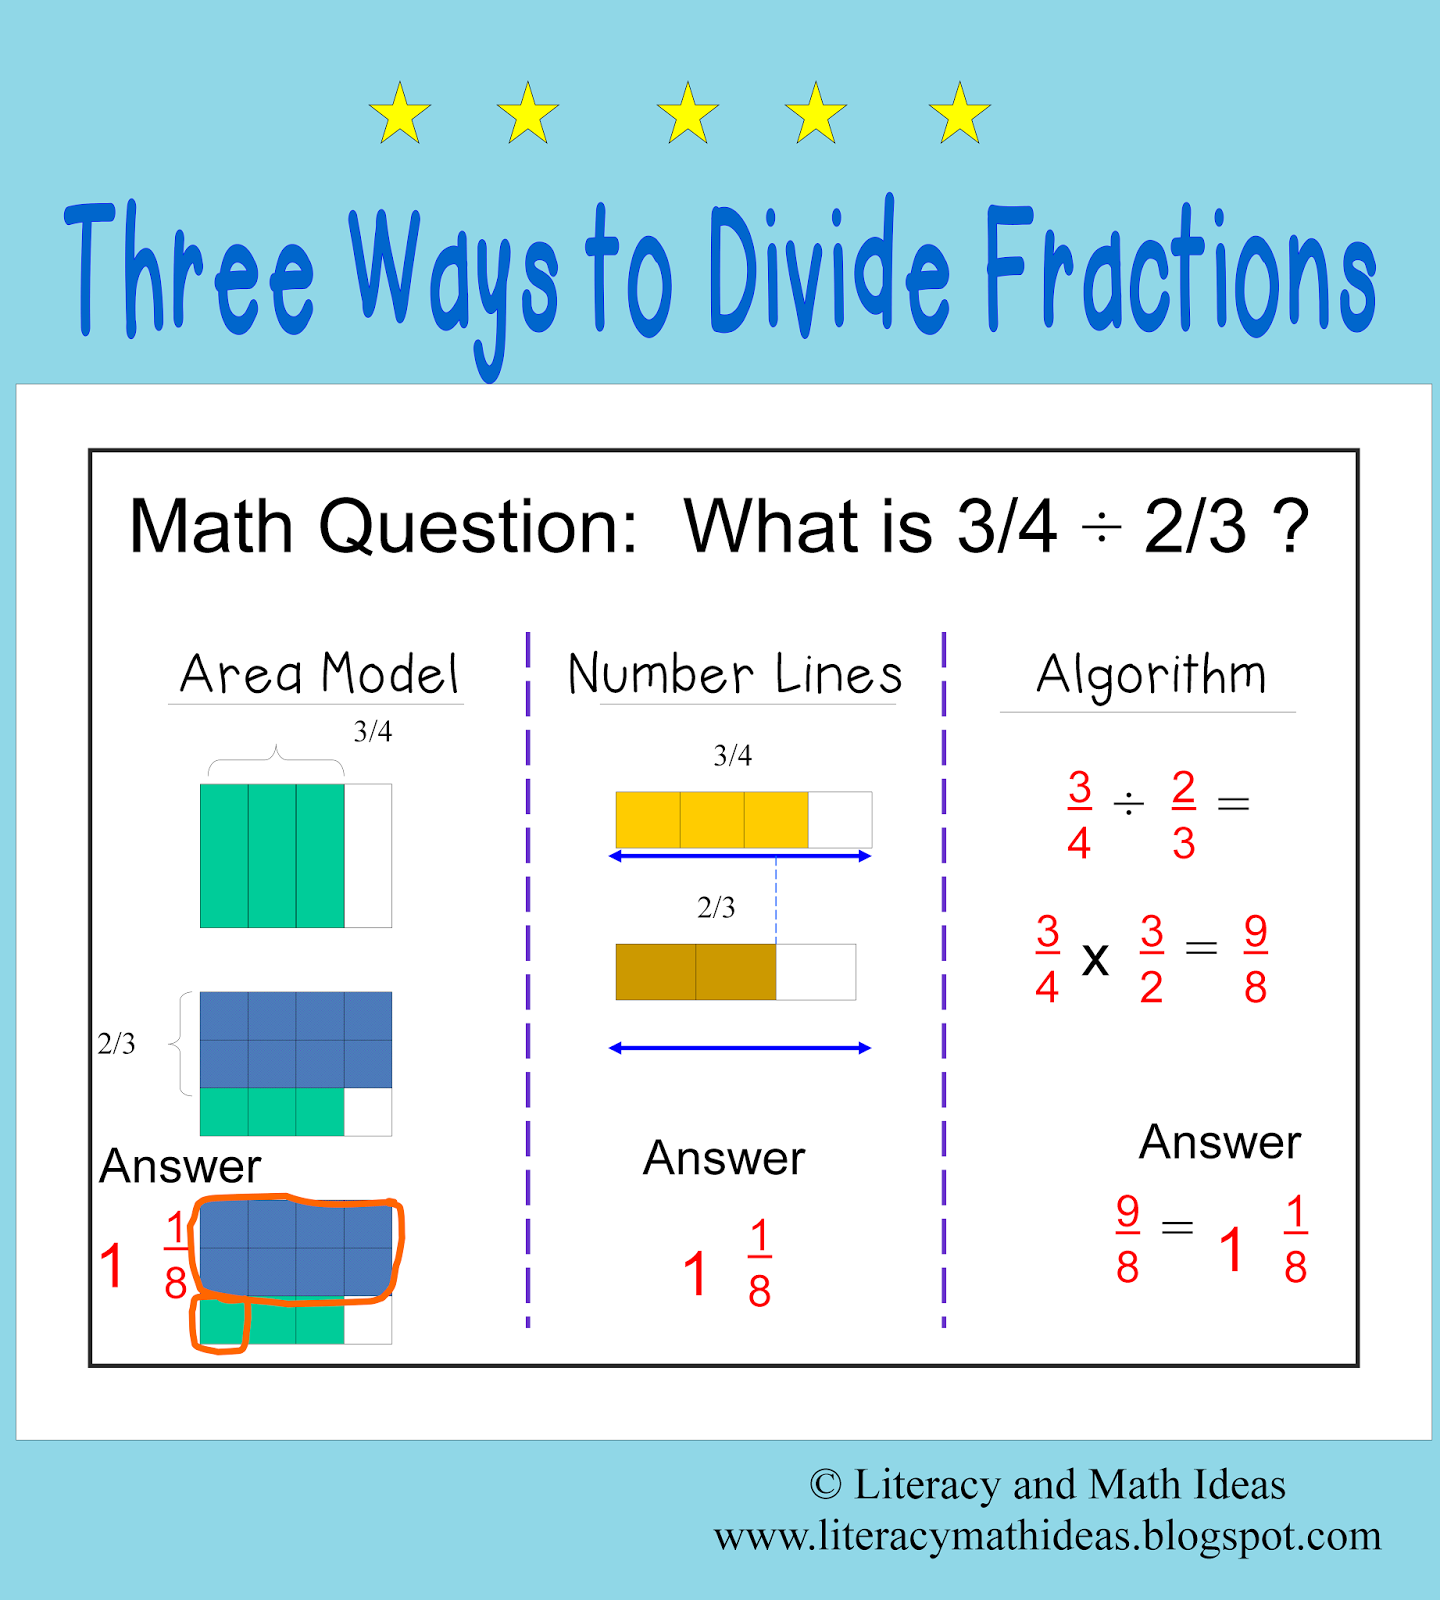 medium resolution of Literacy \u0026 Math Ideas: Three Ways to Divide Fractions   Math fractions